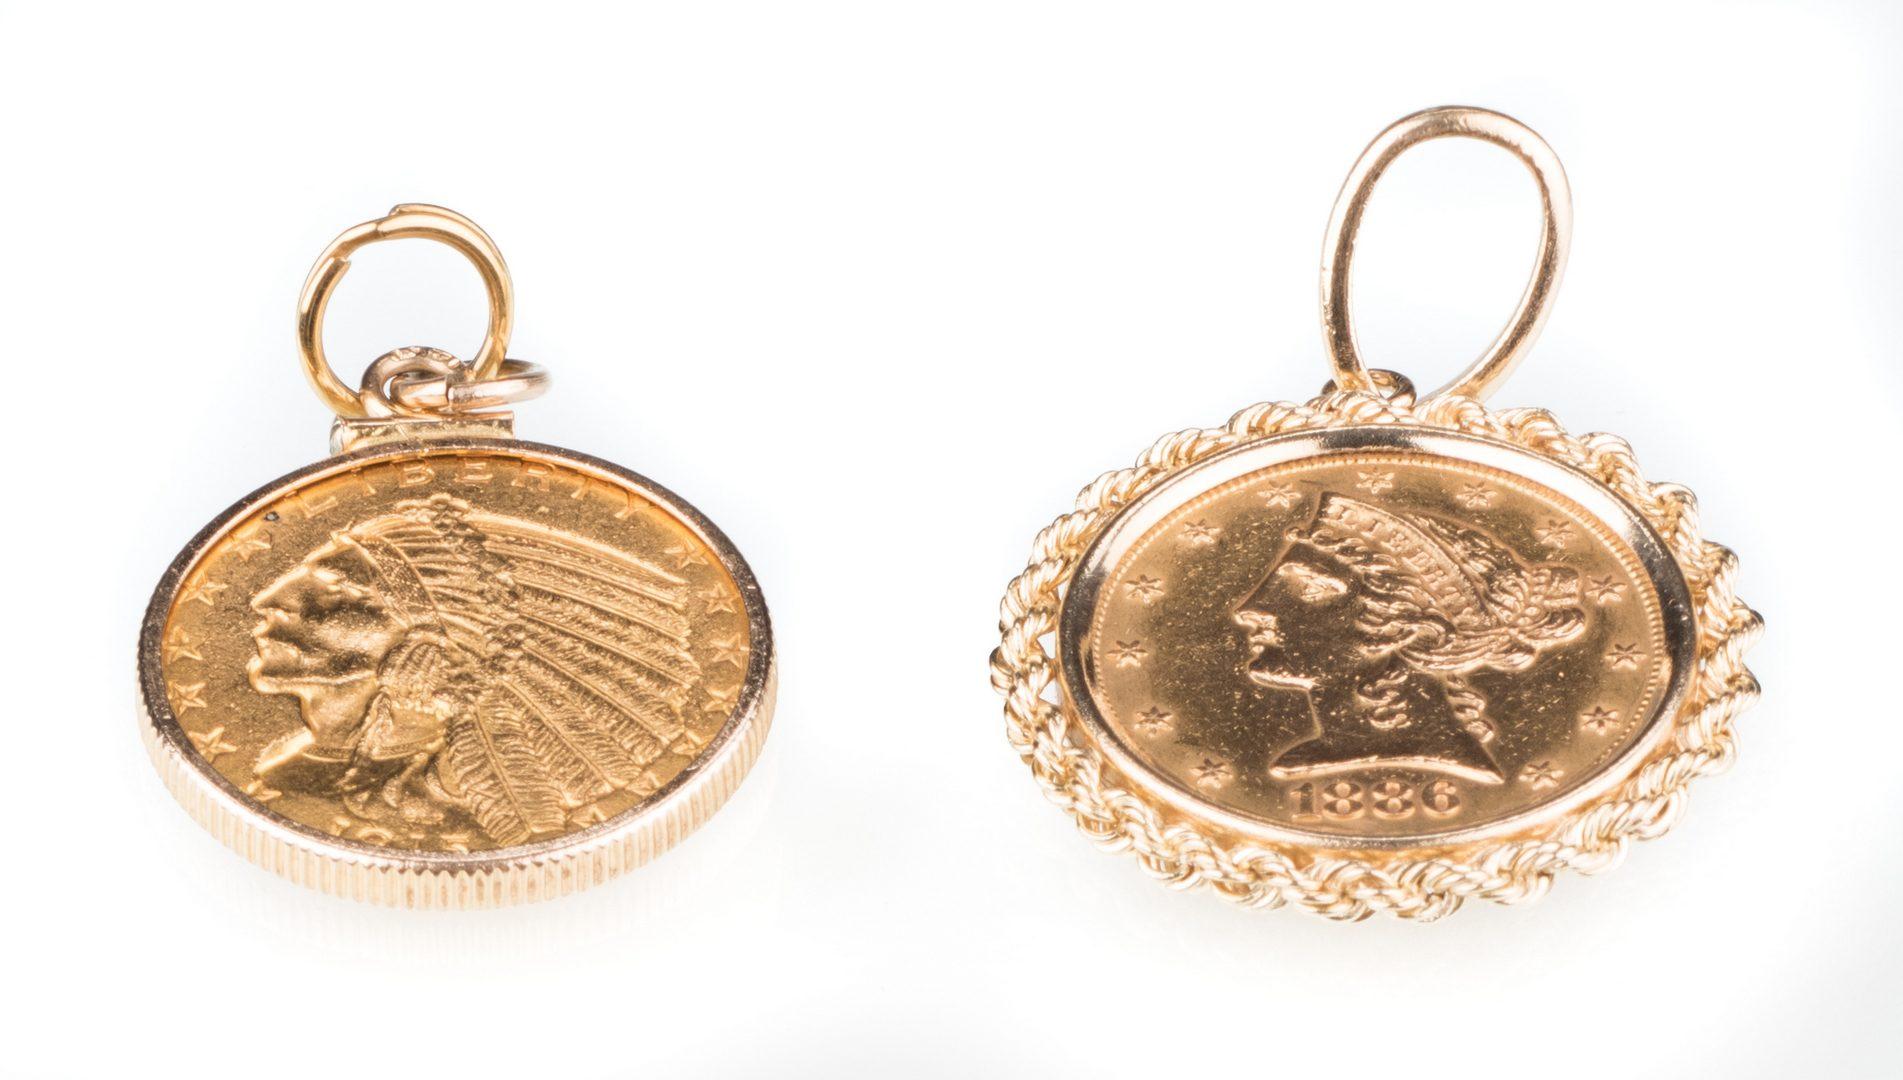 Lot 893: $5 Liberty Head & $5 Indian Head Gold Coins